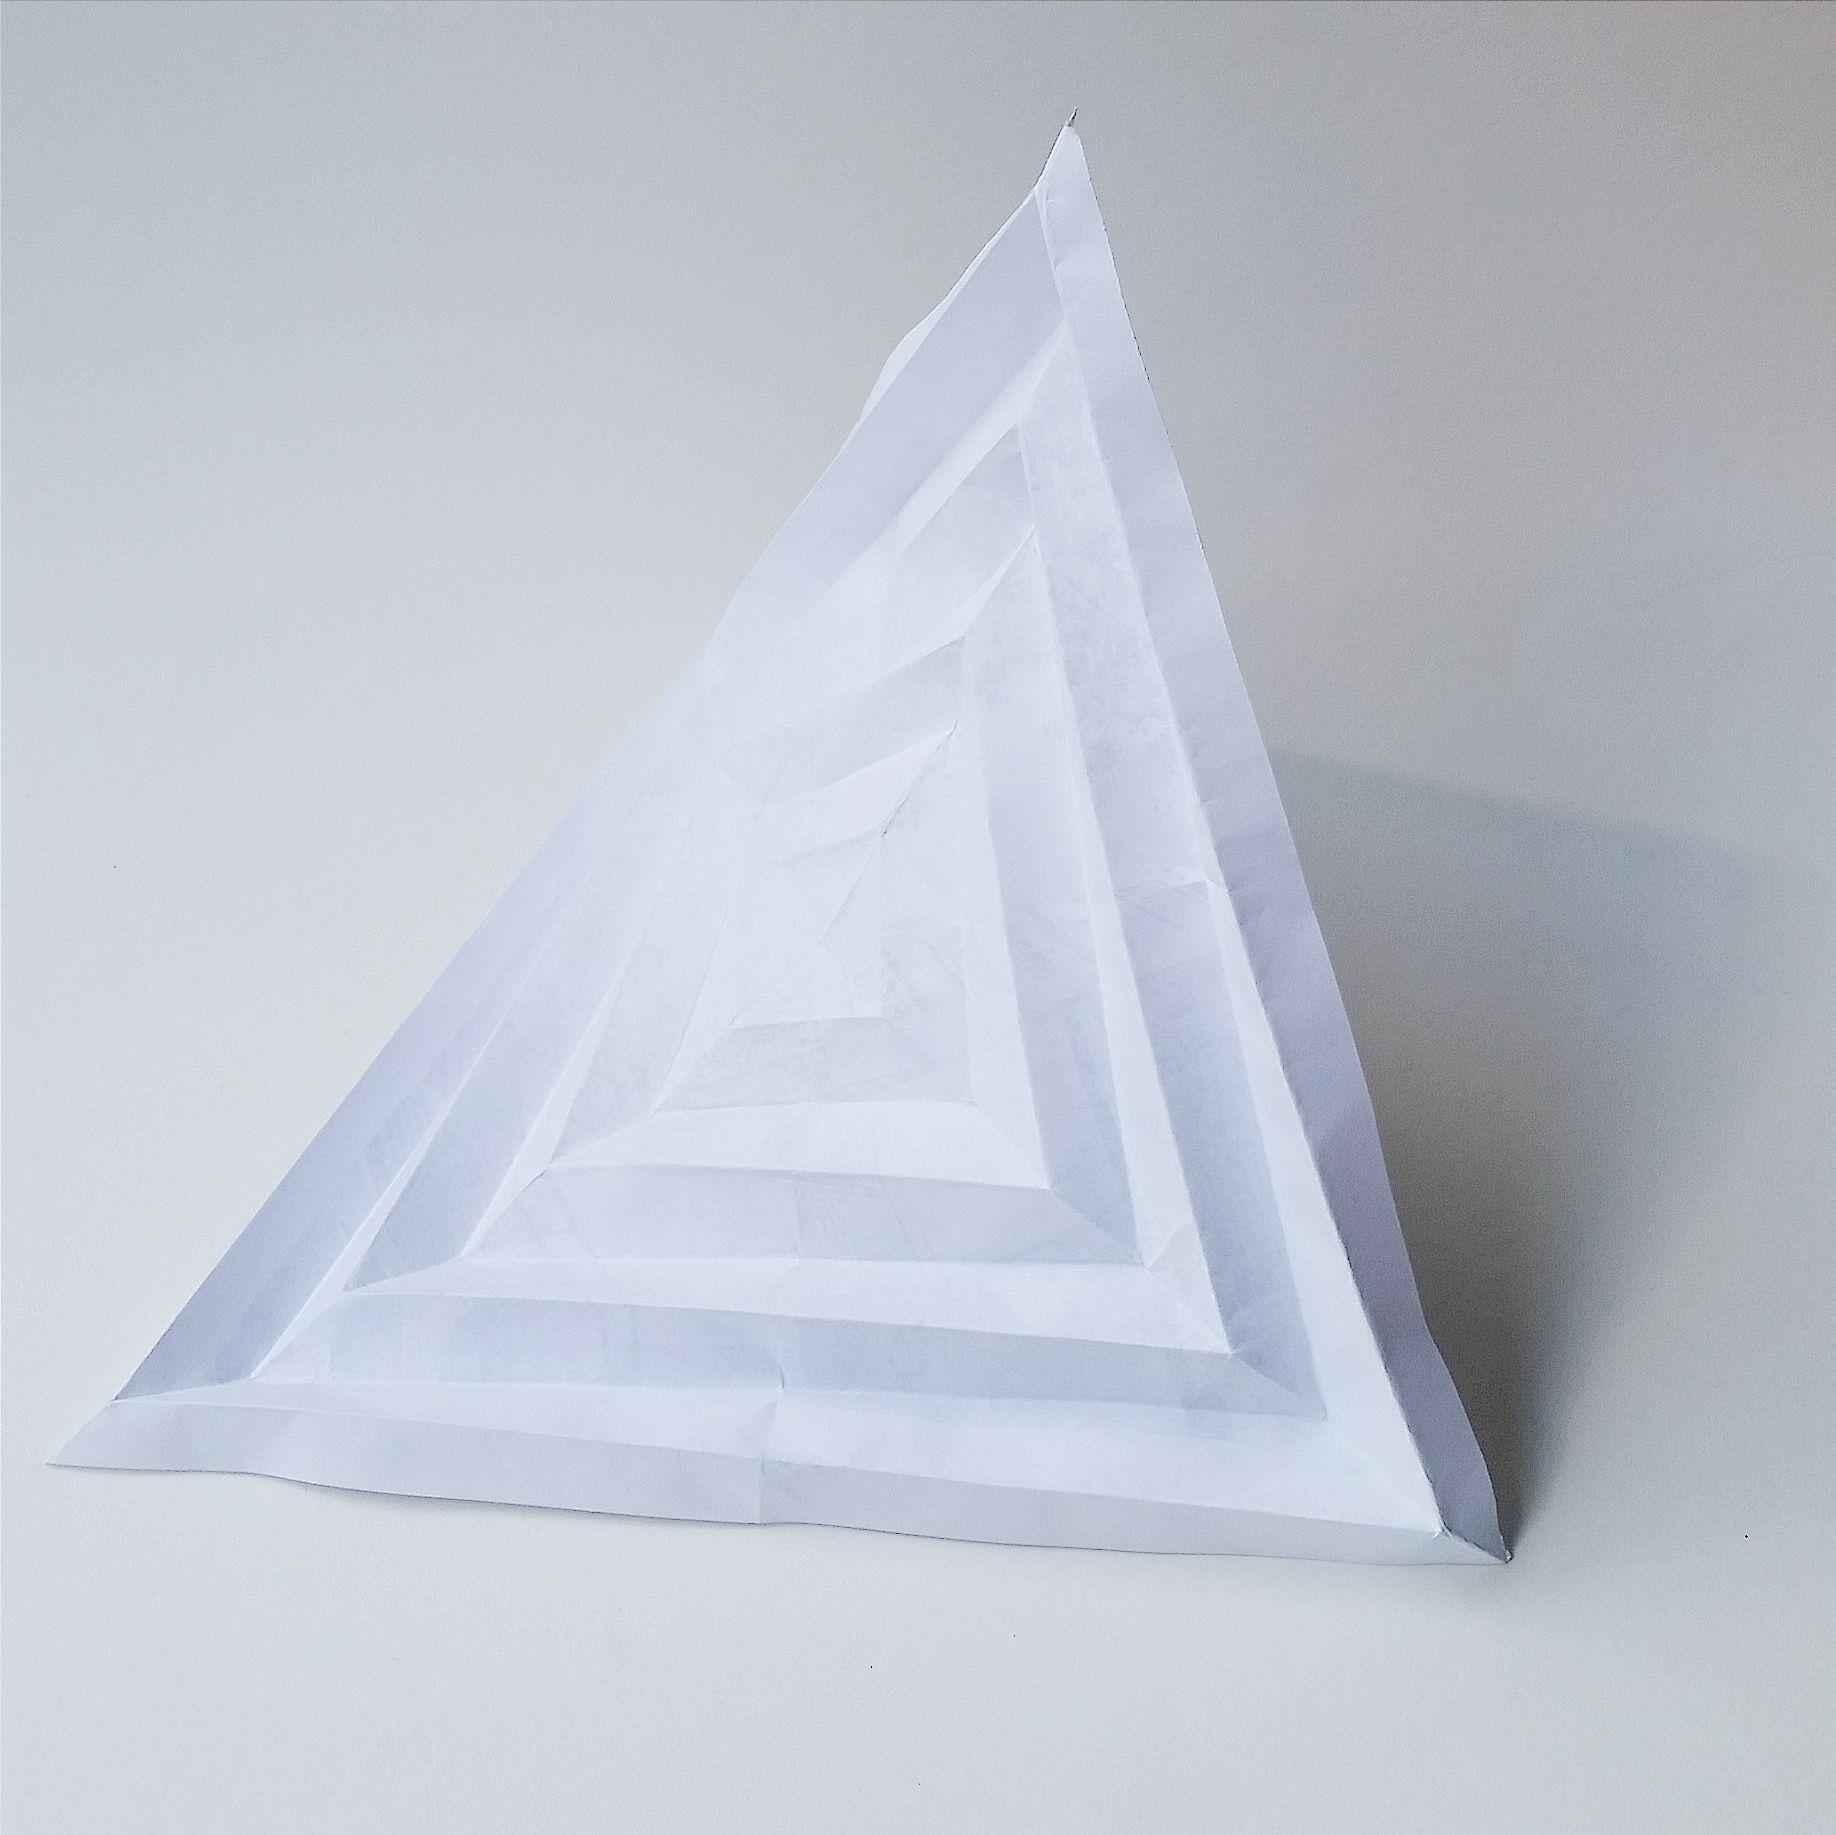 #pattern #squares #blackandwhite #artofnicolewogg